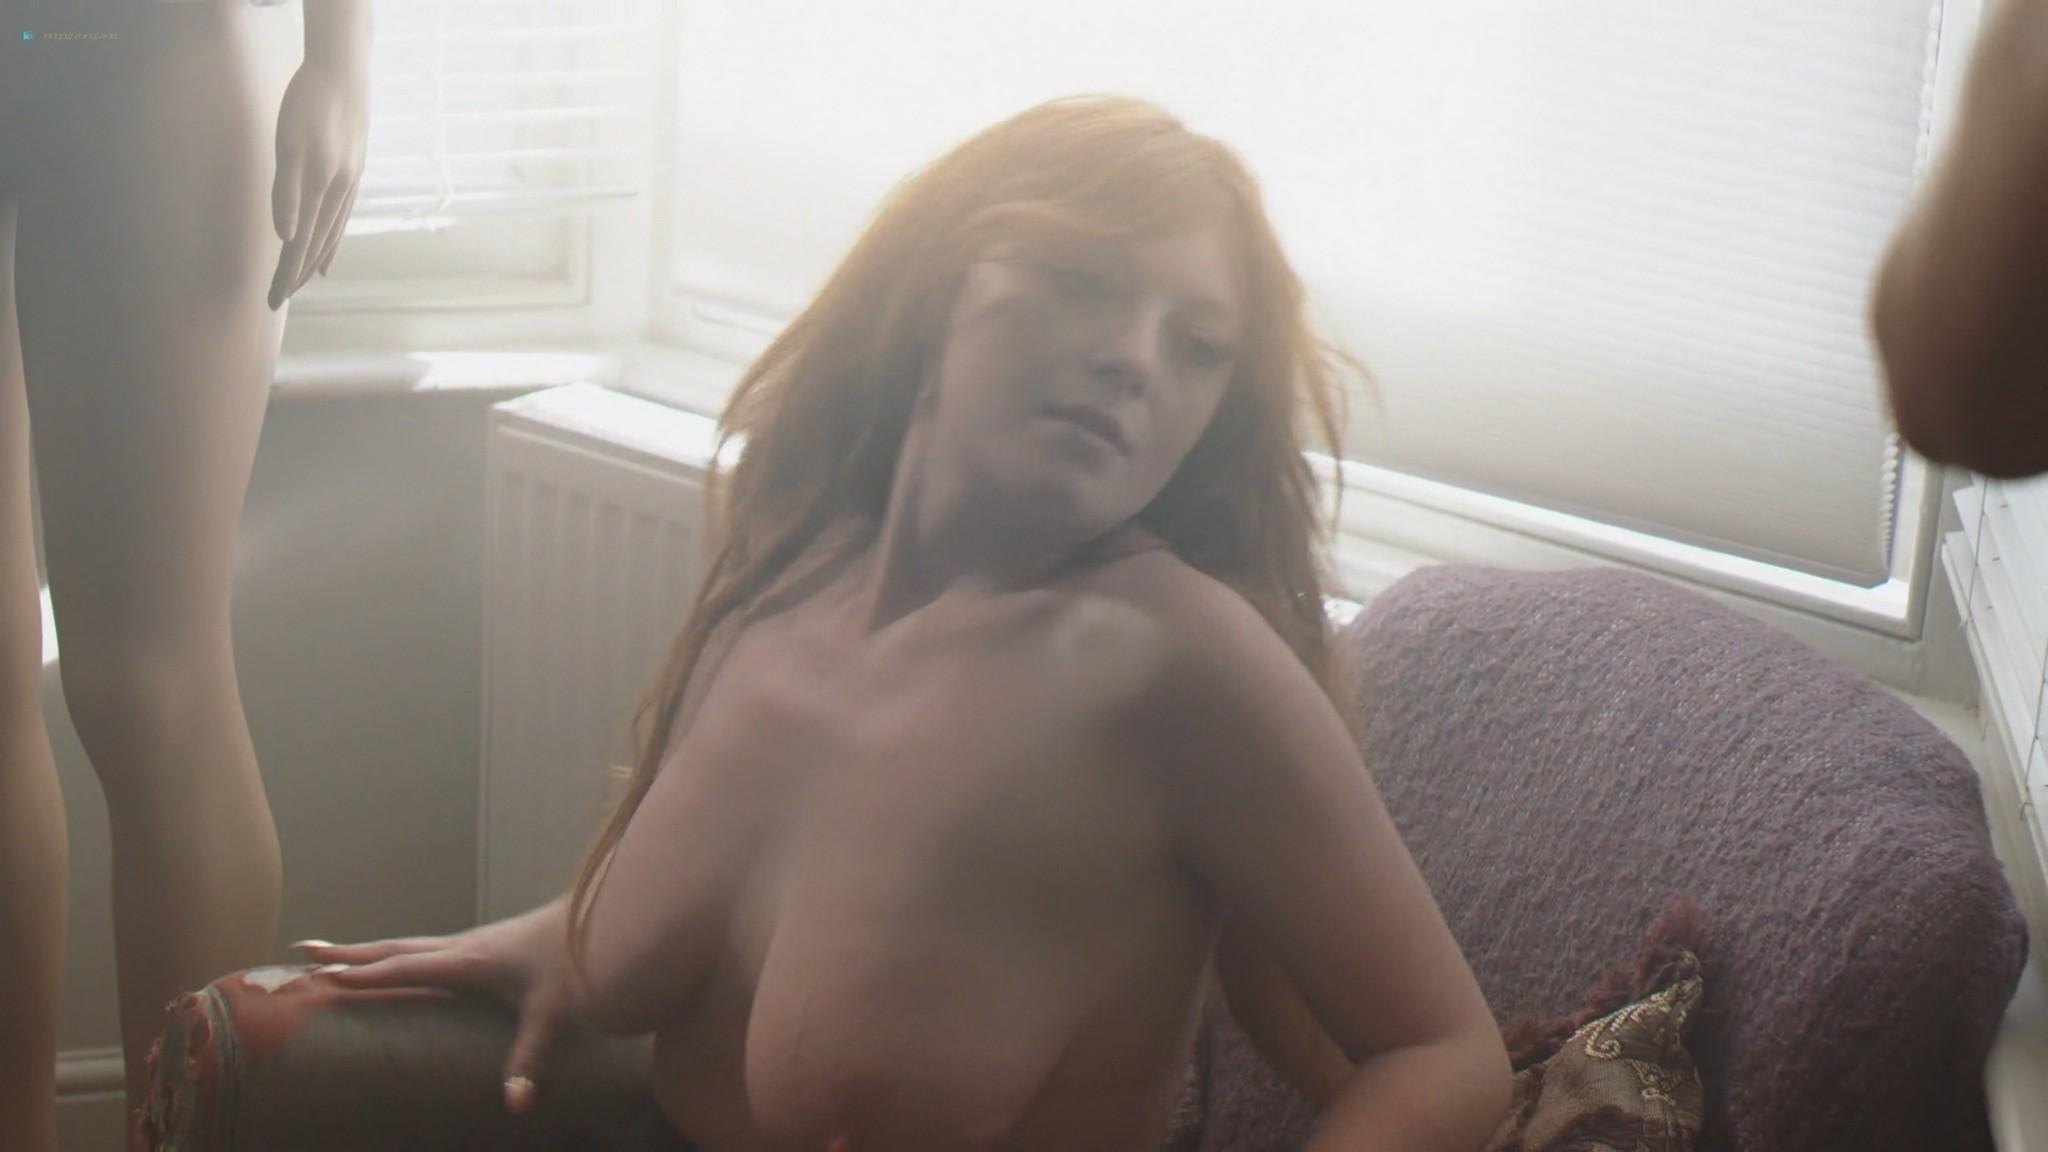 Keely Cat Wells nude Claudine-Helene Aumord full-frontal - Dirty Work (2018) HD 1080p Web (16)